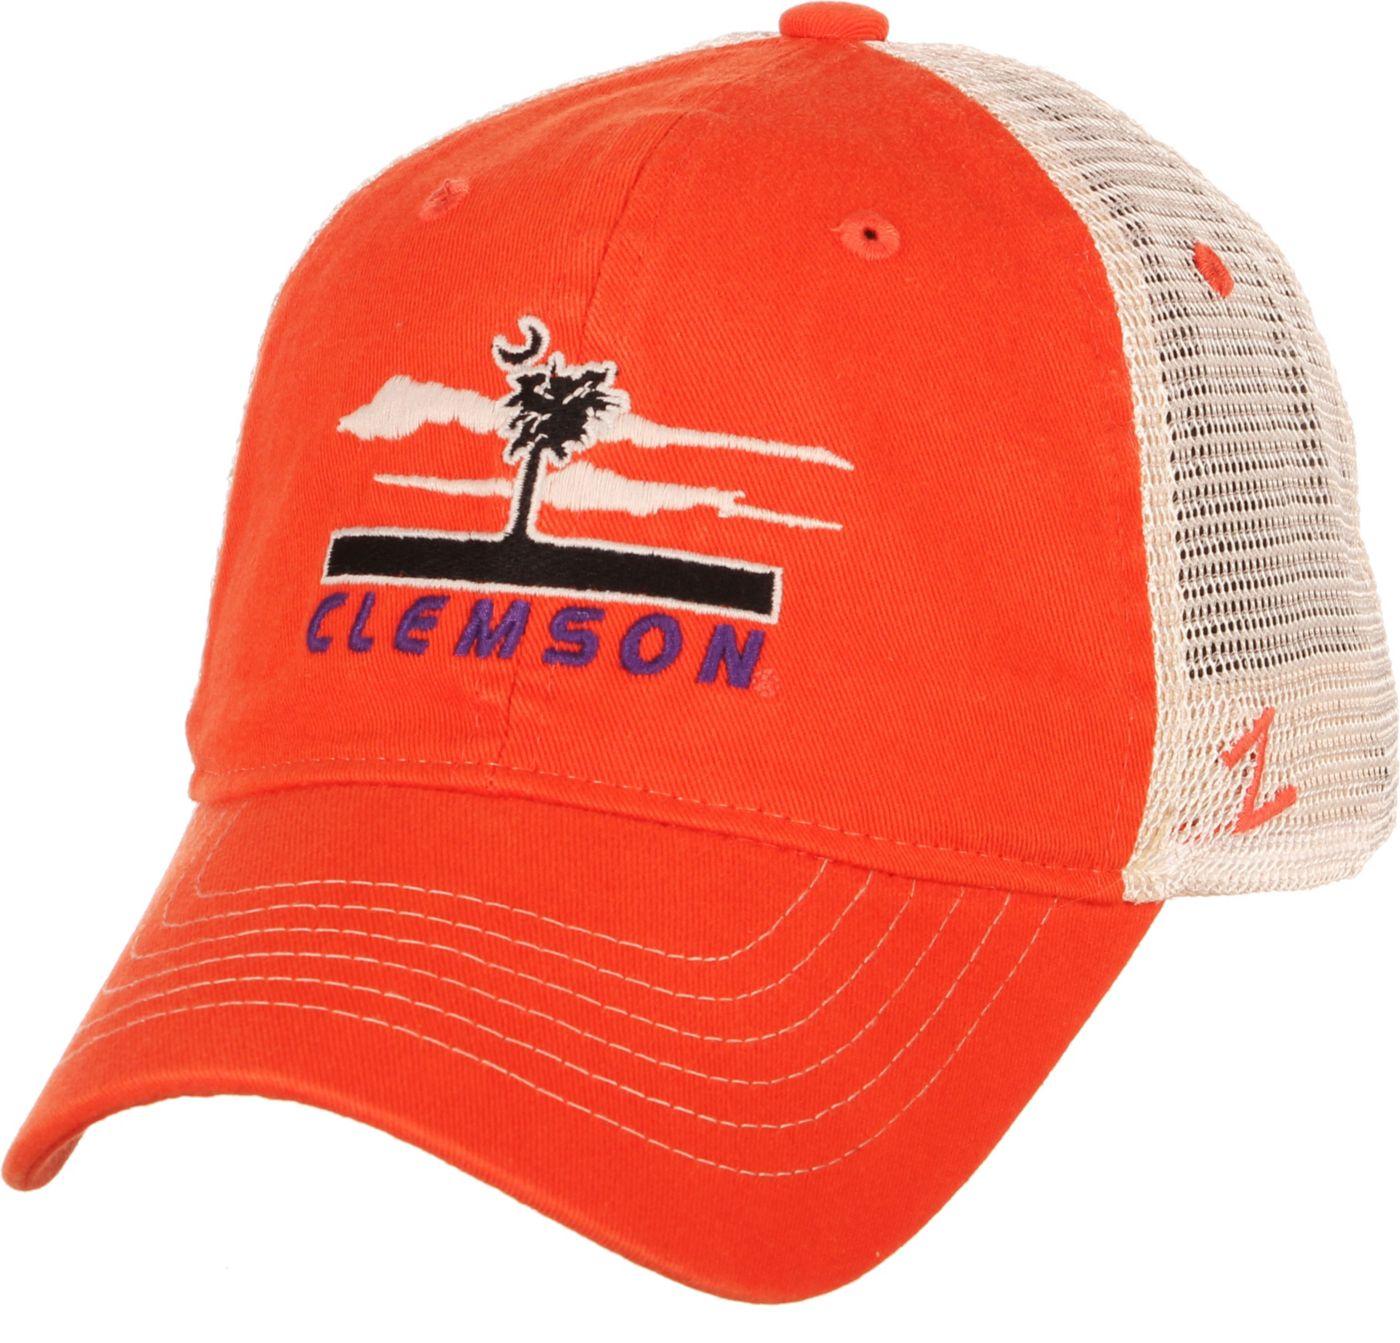 Zephyr Men's Clemson Tigers Orange/White Adjustable Trucker Hat